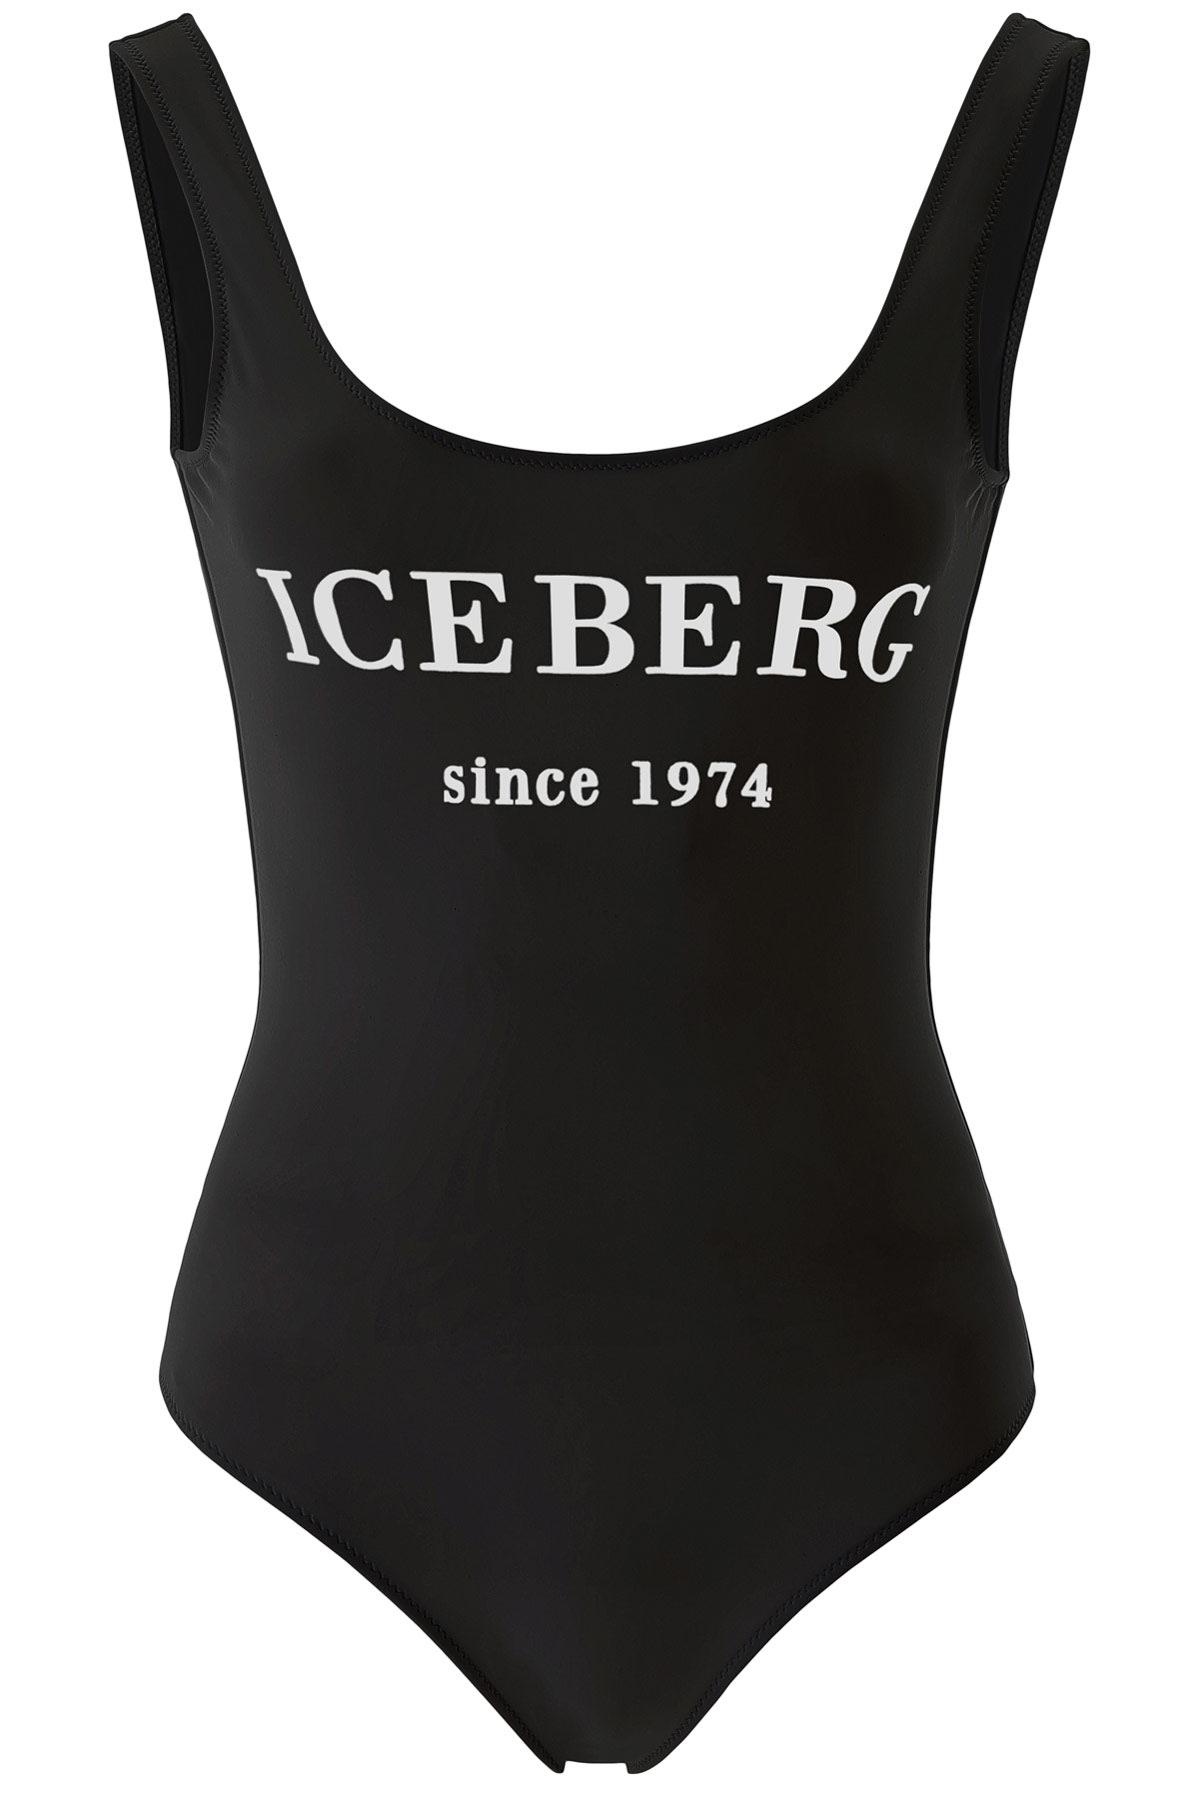 Iceberg LOGO SWIMSUIT